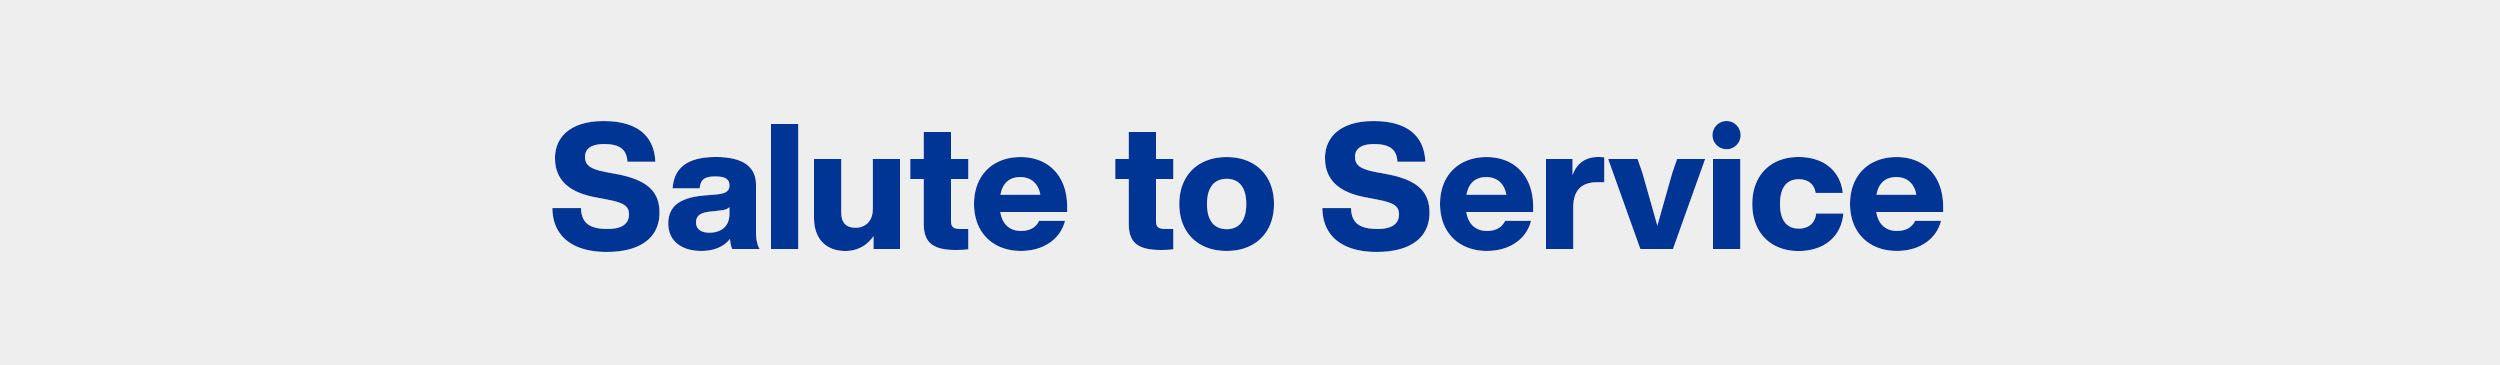 website-salute-to-service